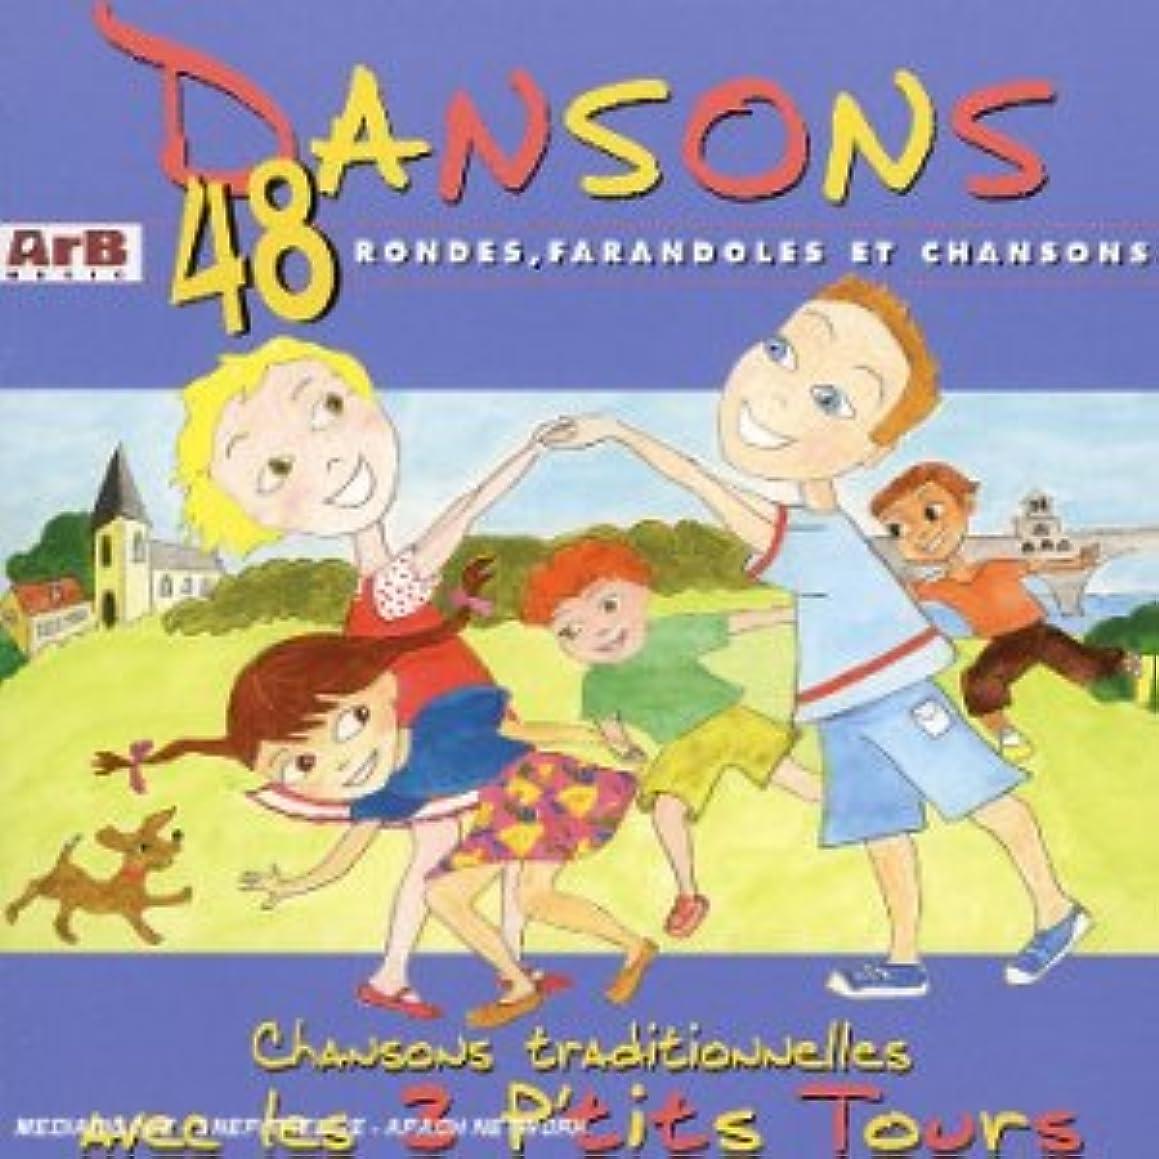 48 Chansons